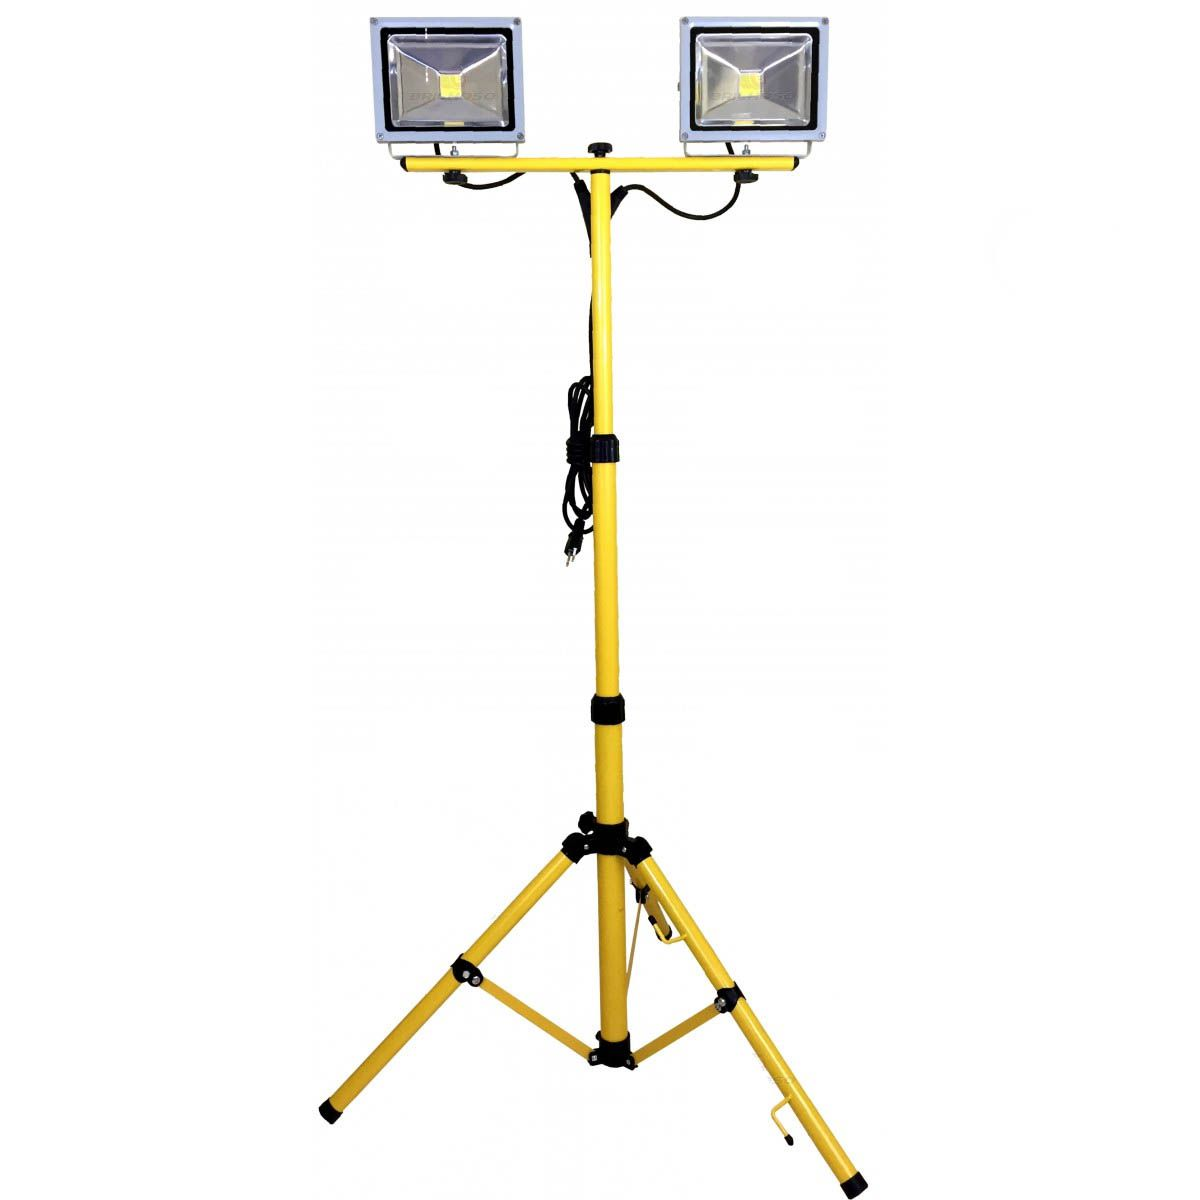 Tripé De Luz Refletor Dual Led - 20 Watts - 220V - Kers